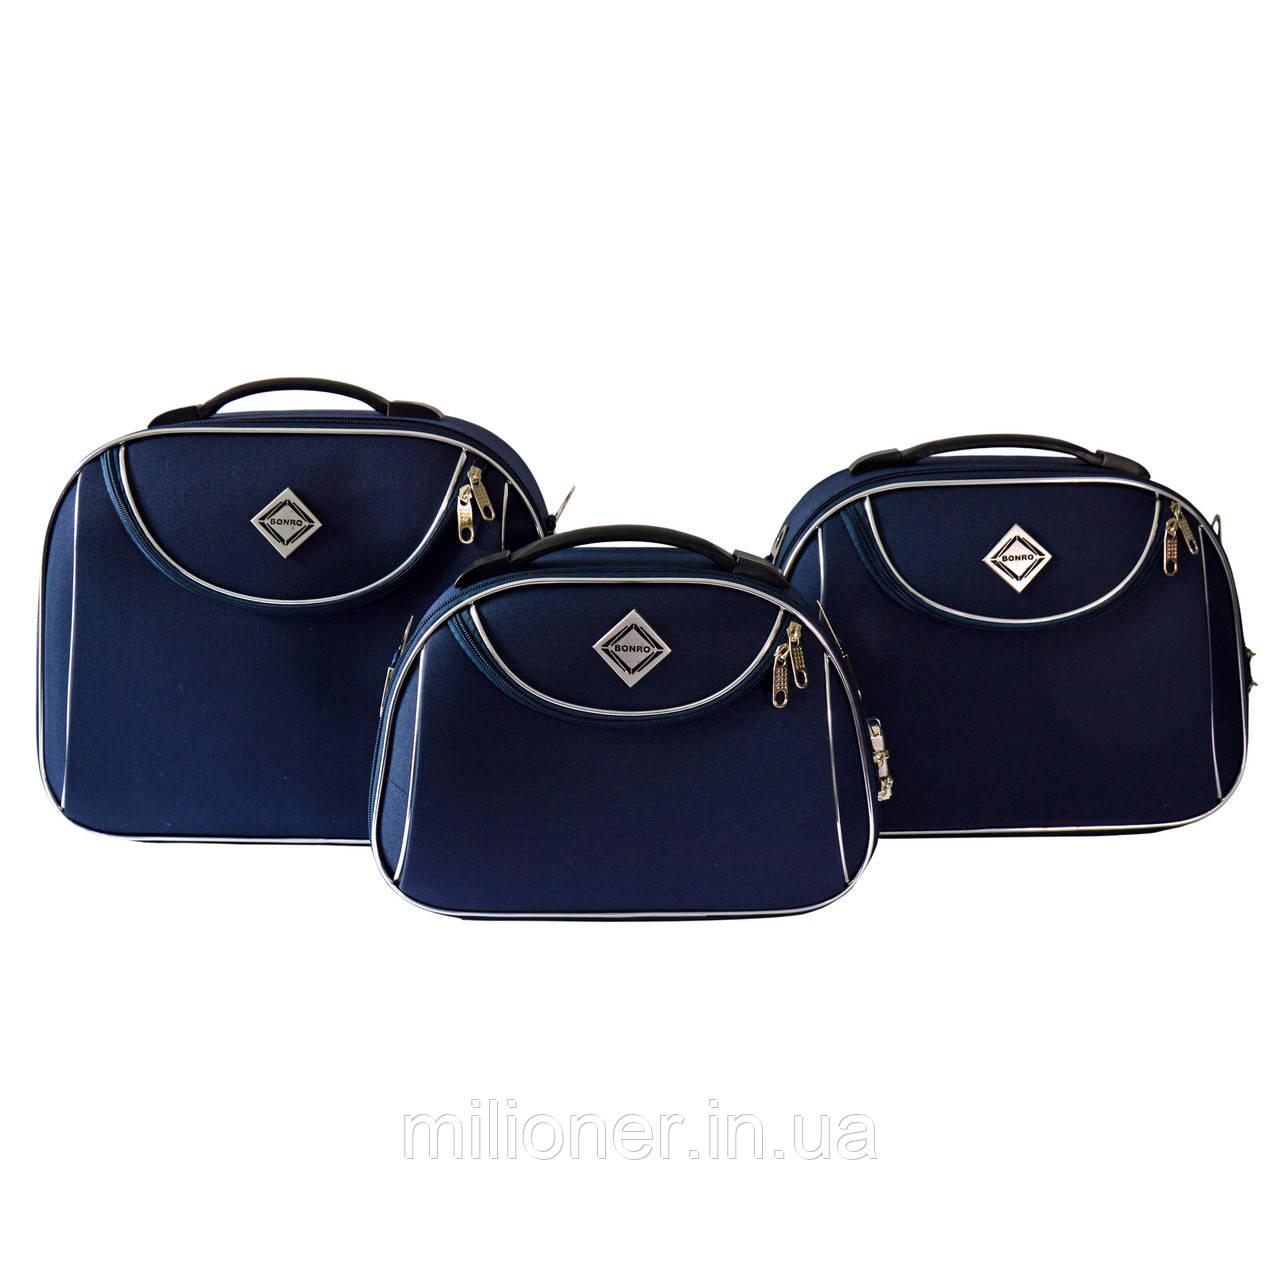 Сумка кейс саквояж 3в1 Bonro Style синий